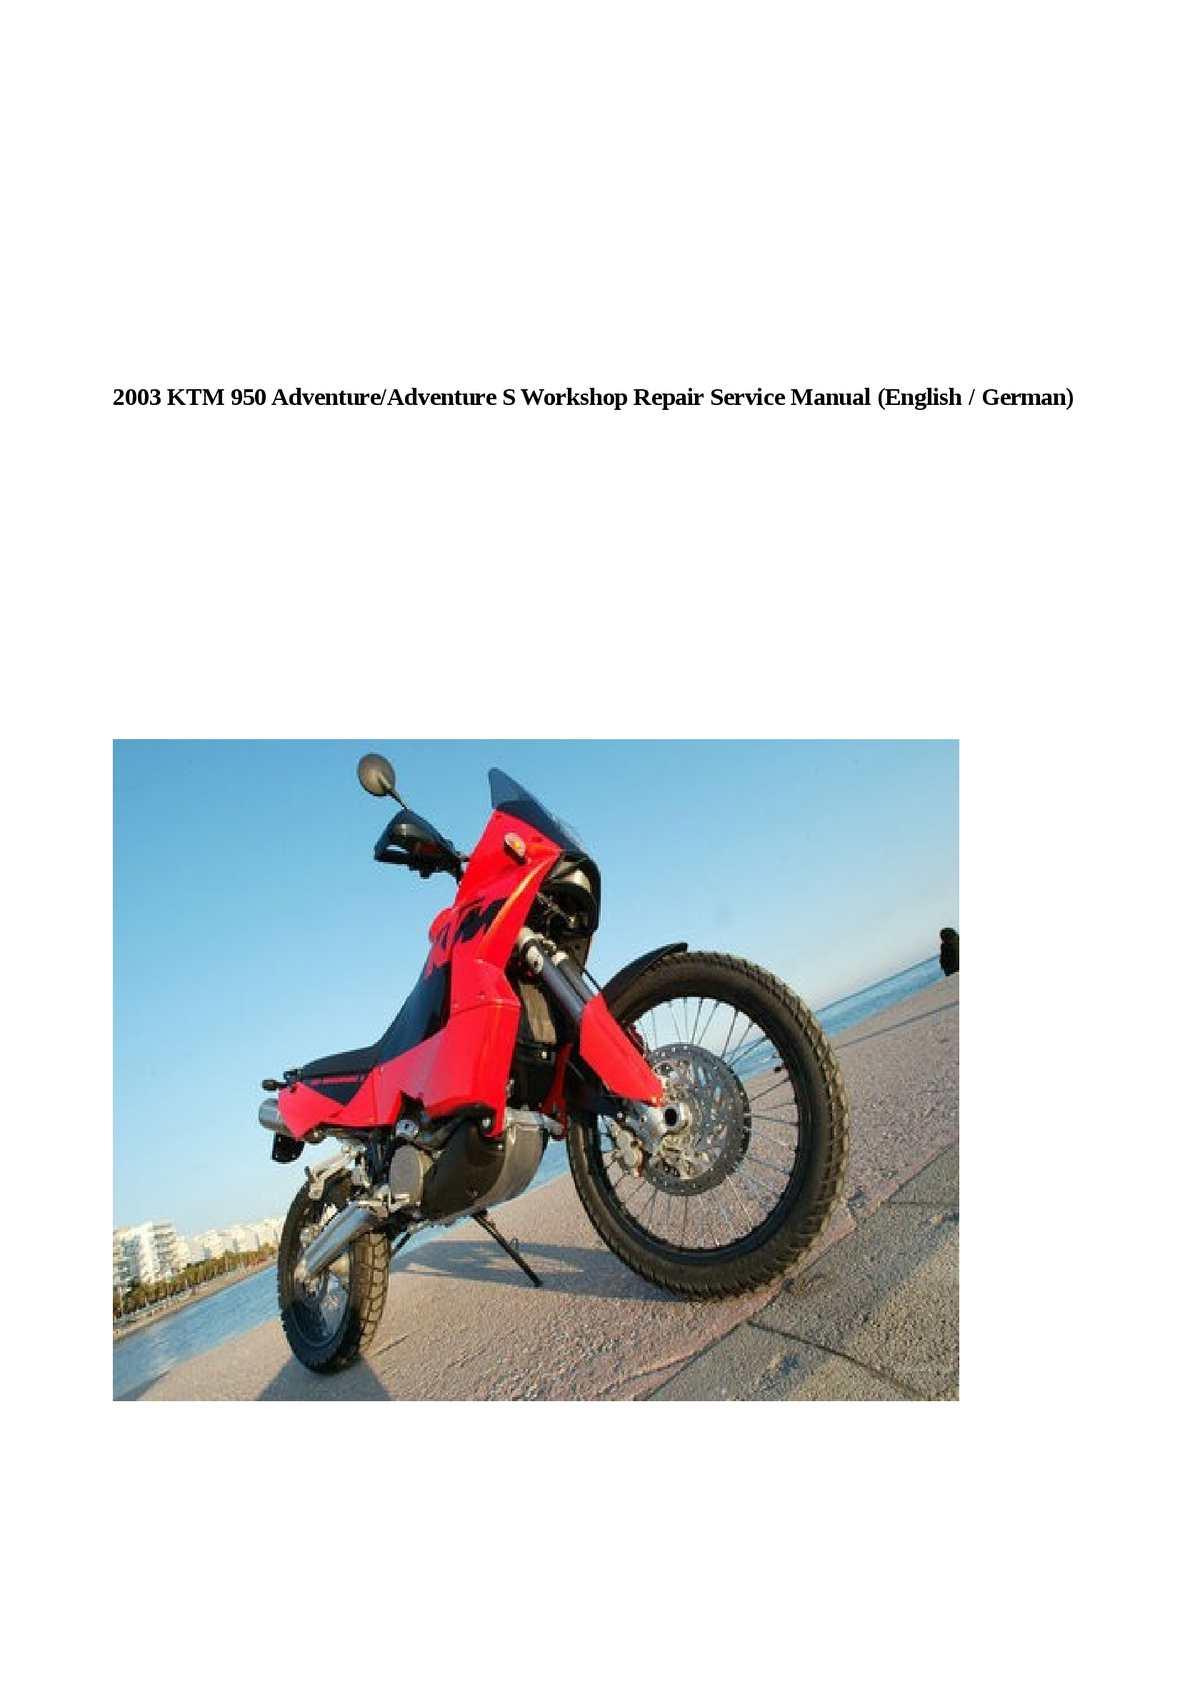 Calaméo - 2003 KTM 950 Adventure/Adventure S Workshop Repair Service Manu